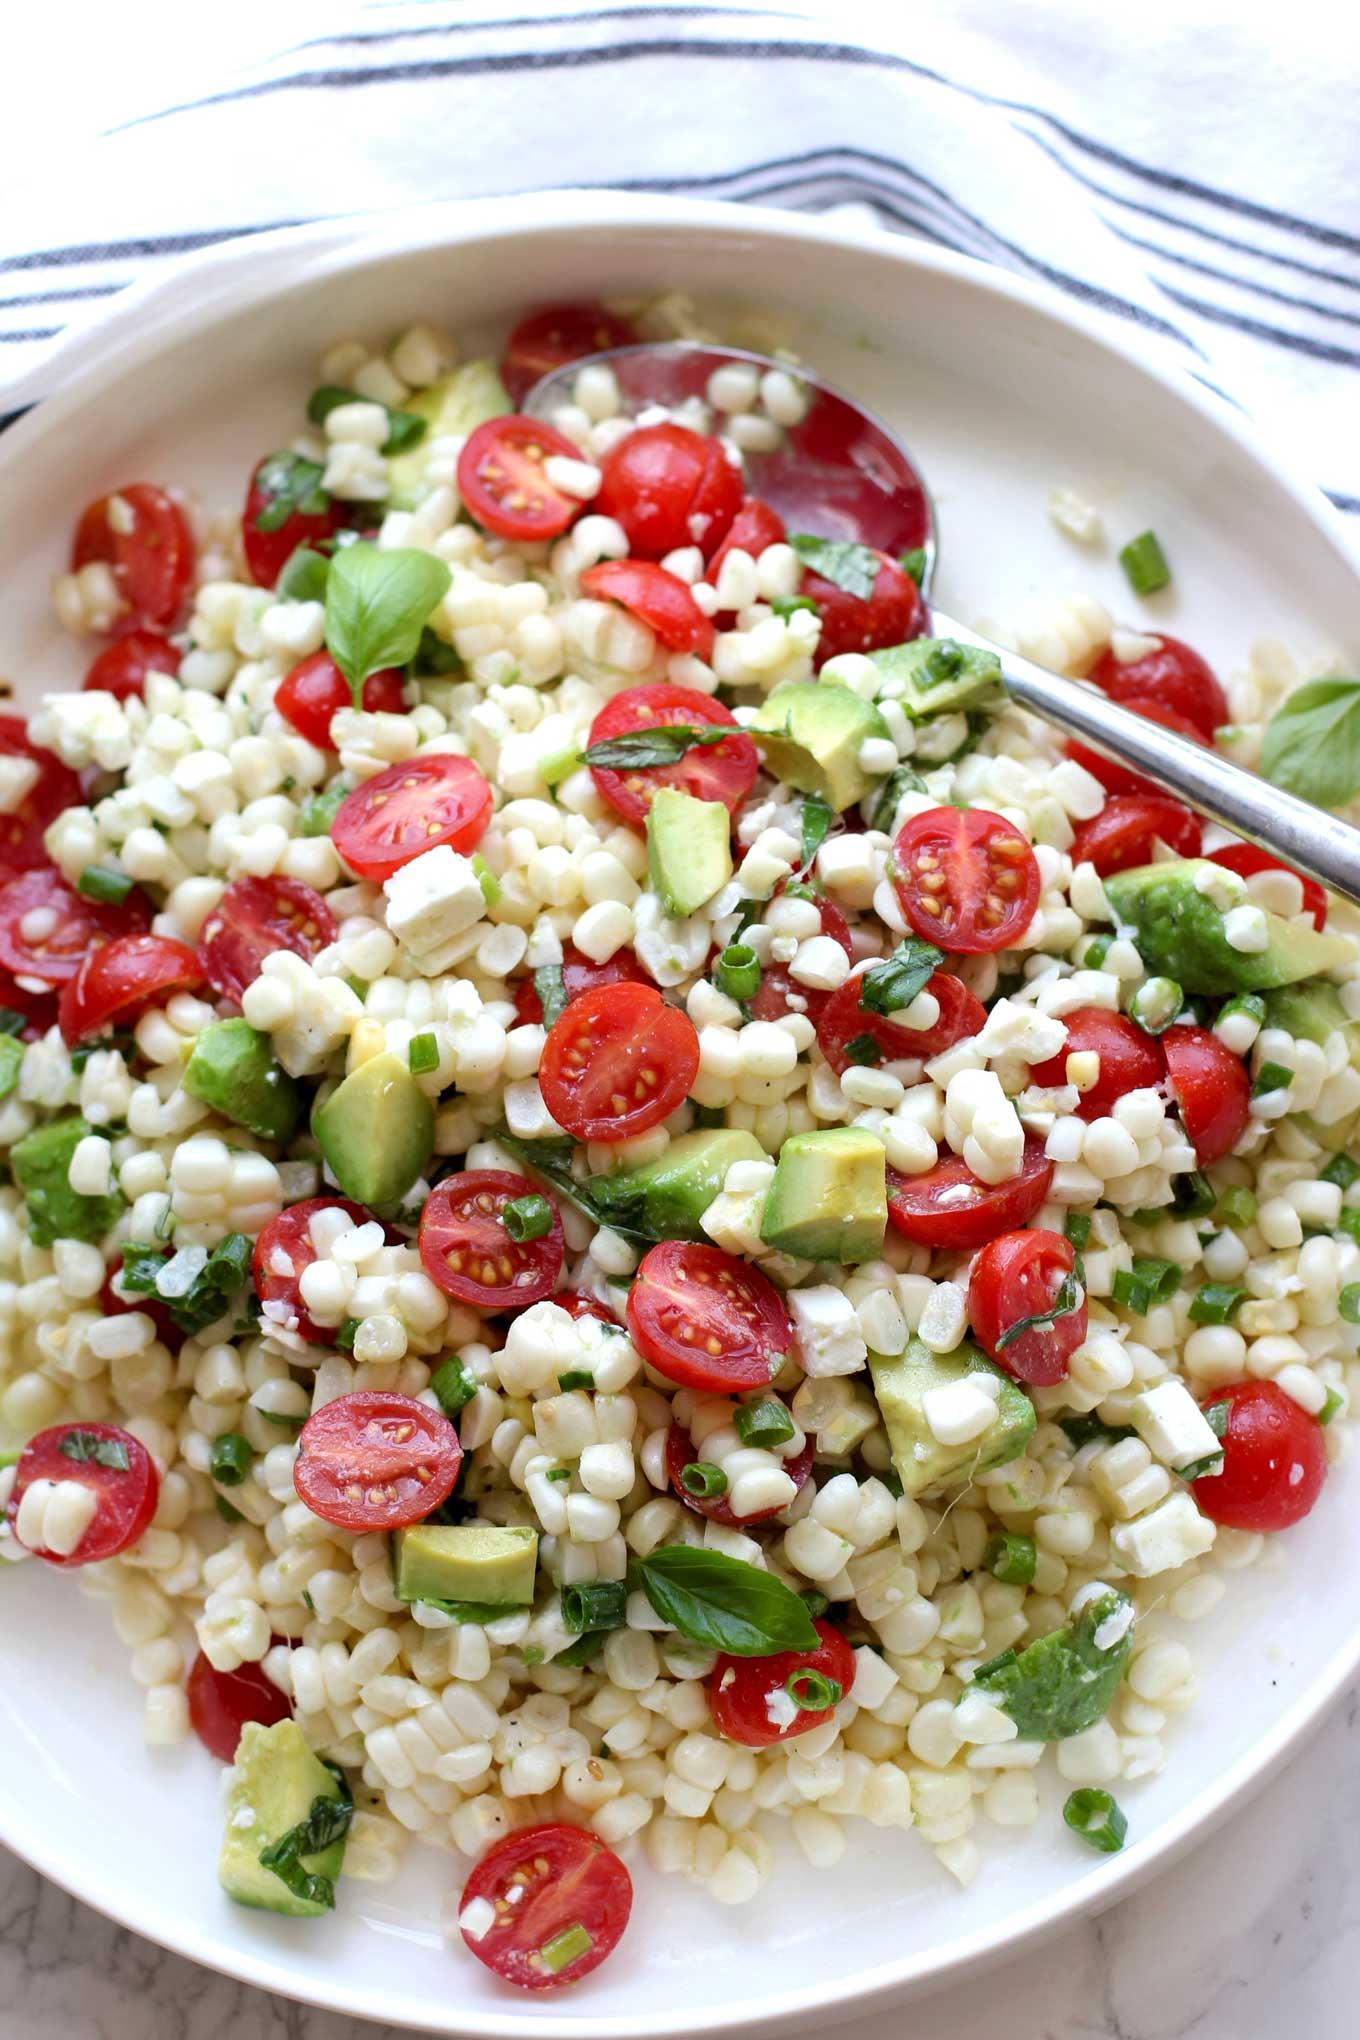 Fresh-Corn-Salad-With-Cherry-Tomatoes-And-Avocado-closeup